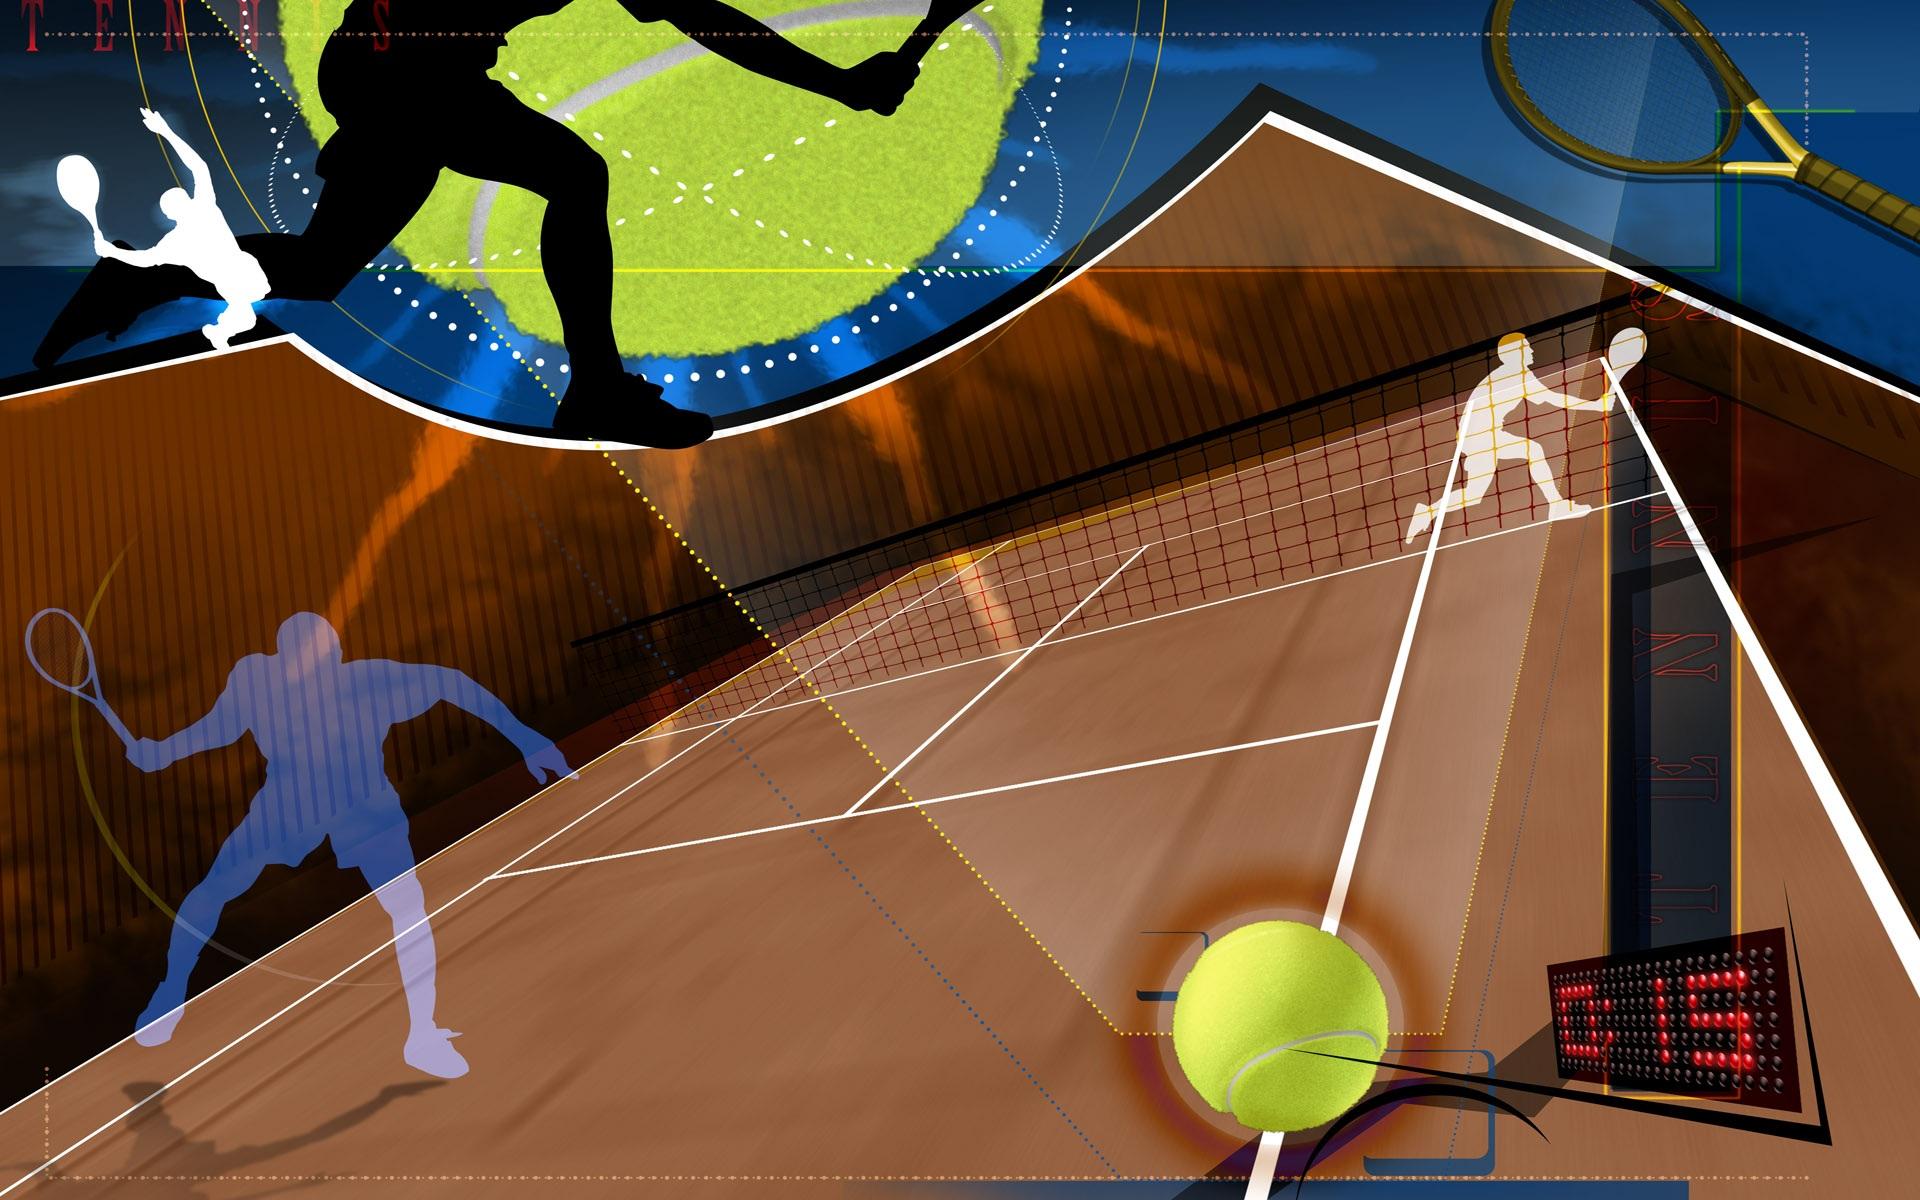 [48+] Tennis Wallpapers HD On WallpaperSafari